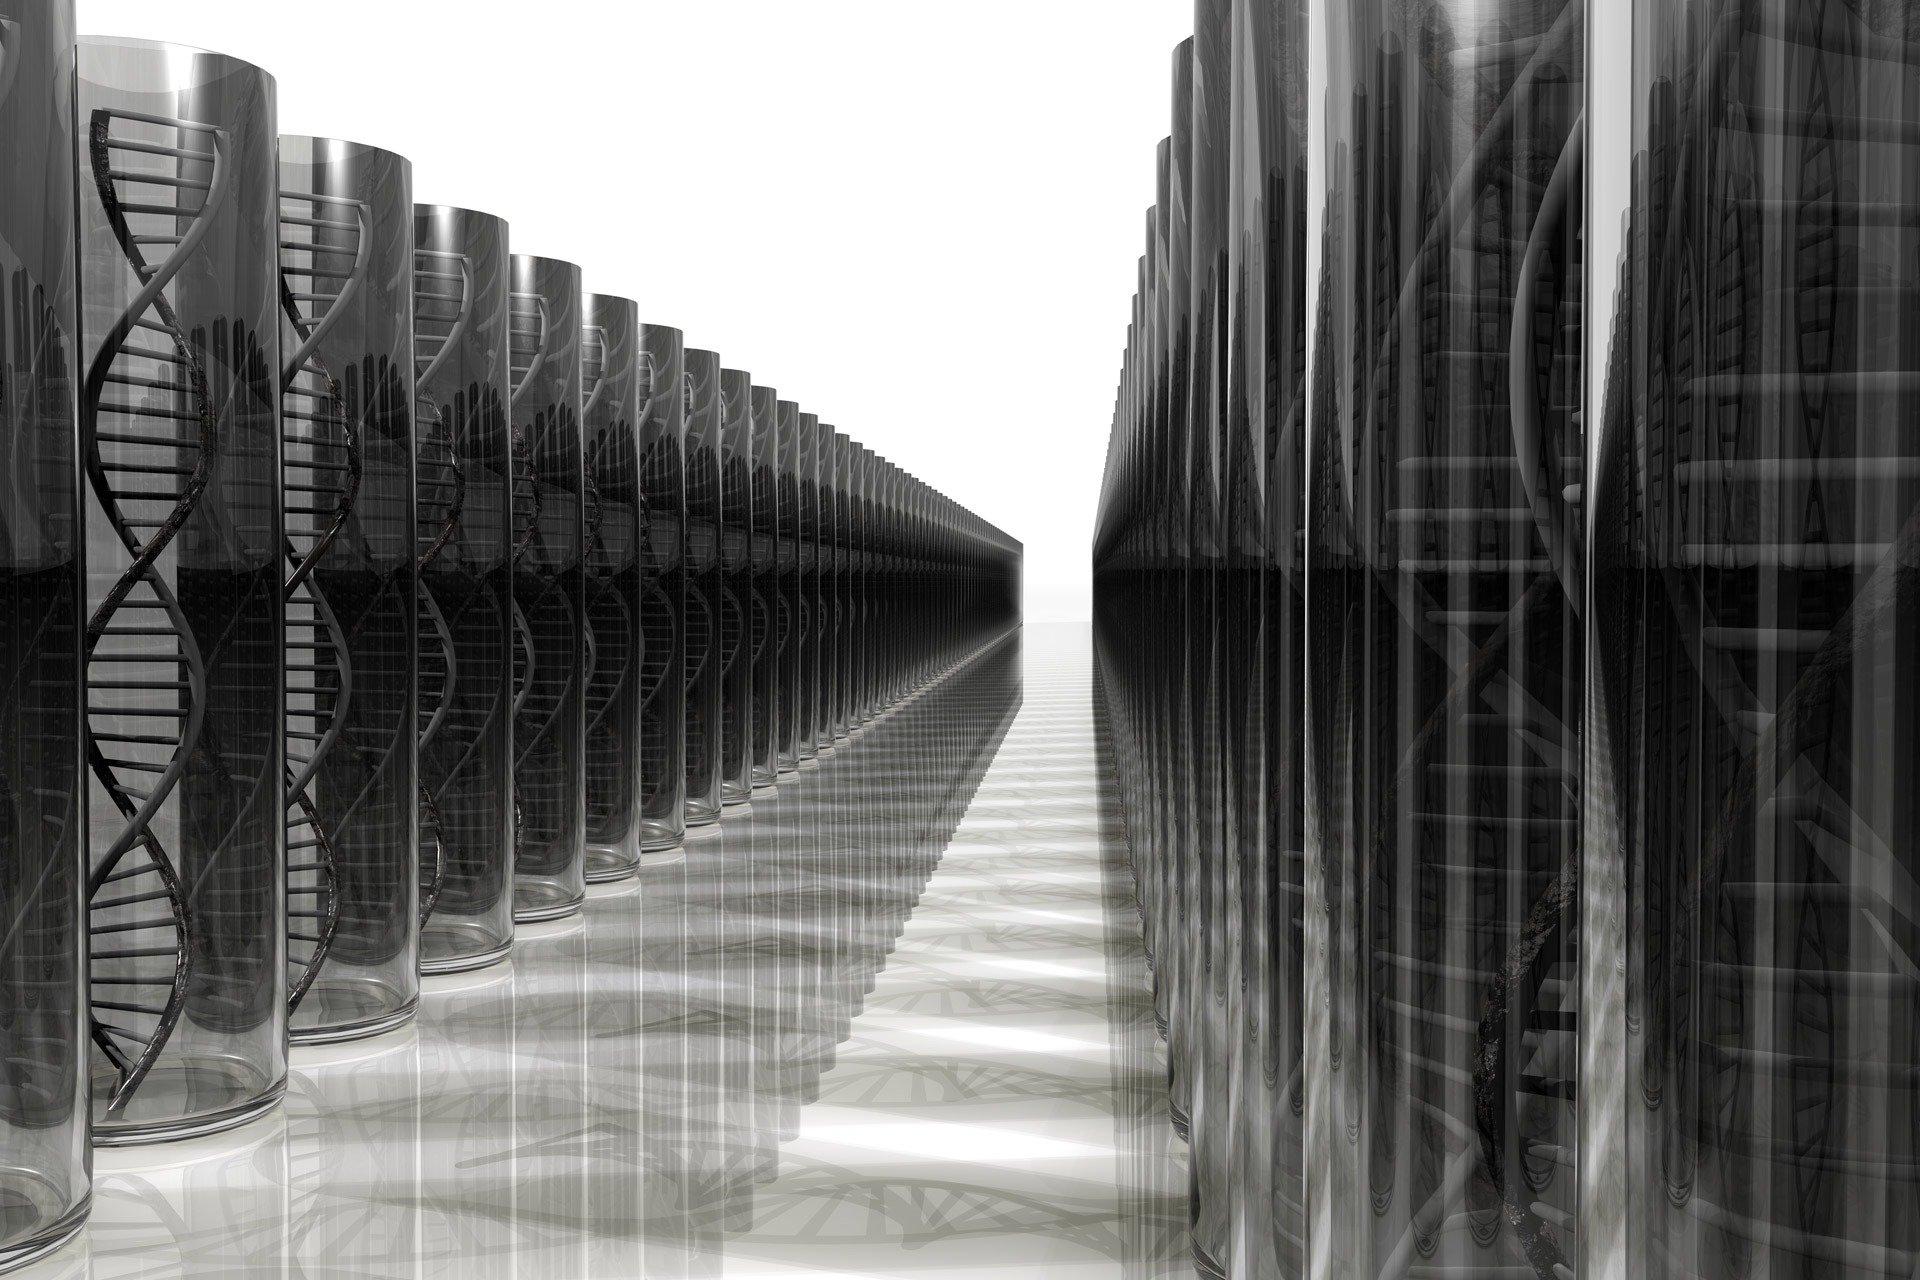 spirali di dna allineate in bianco e nero